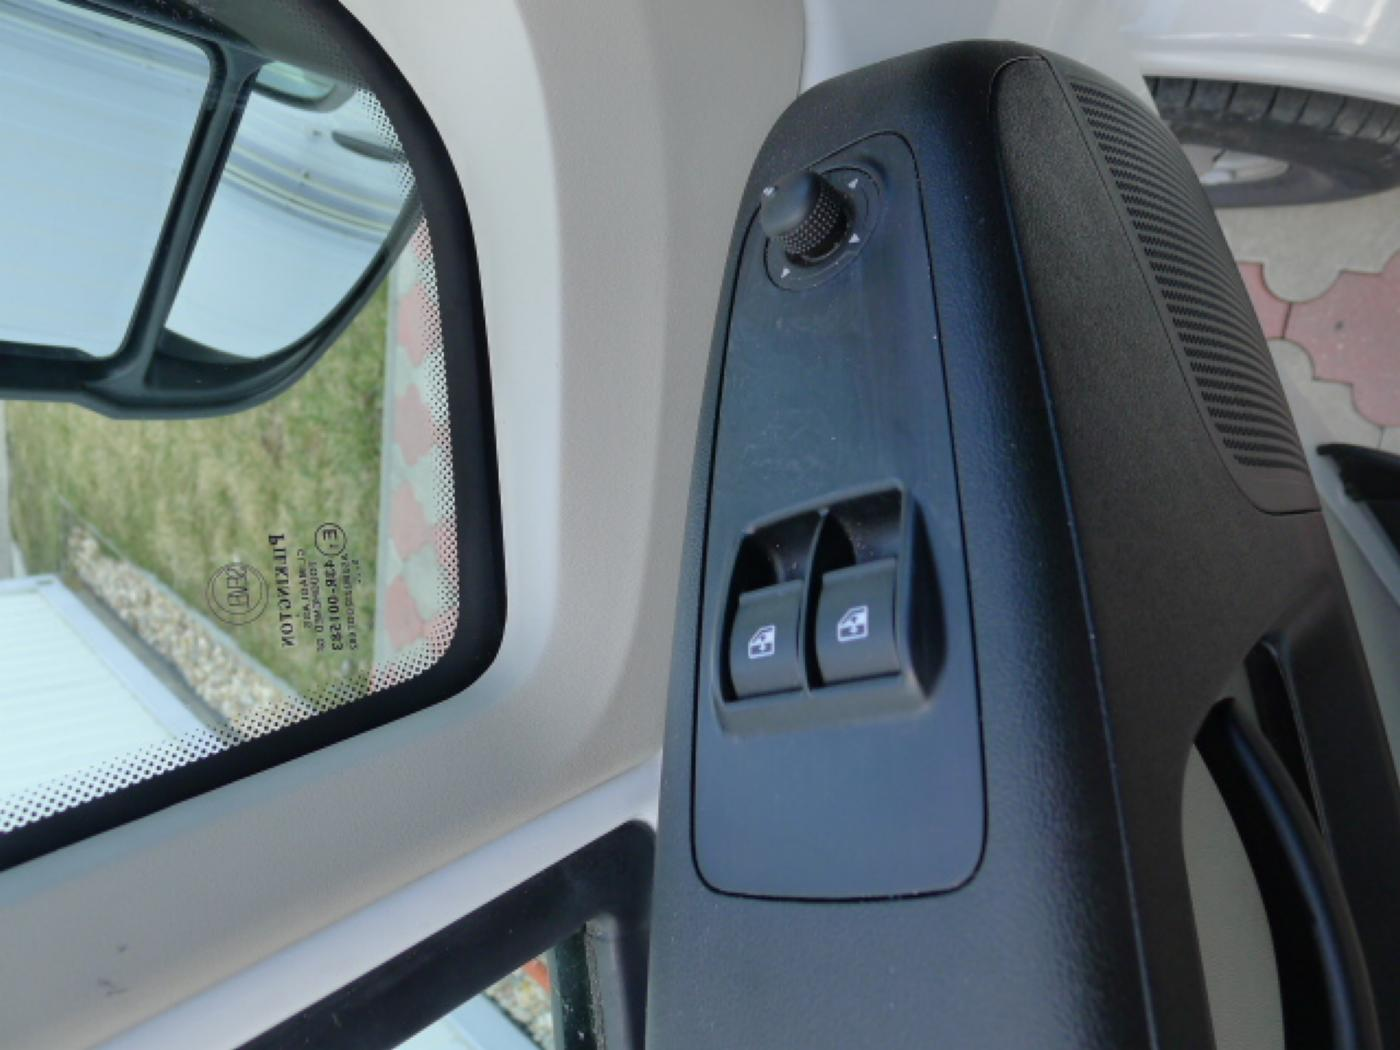 Peugeot Boxer 2,2 HDI Valnik+Plachta+Klima+Mìchy - 15